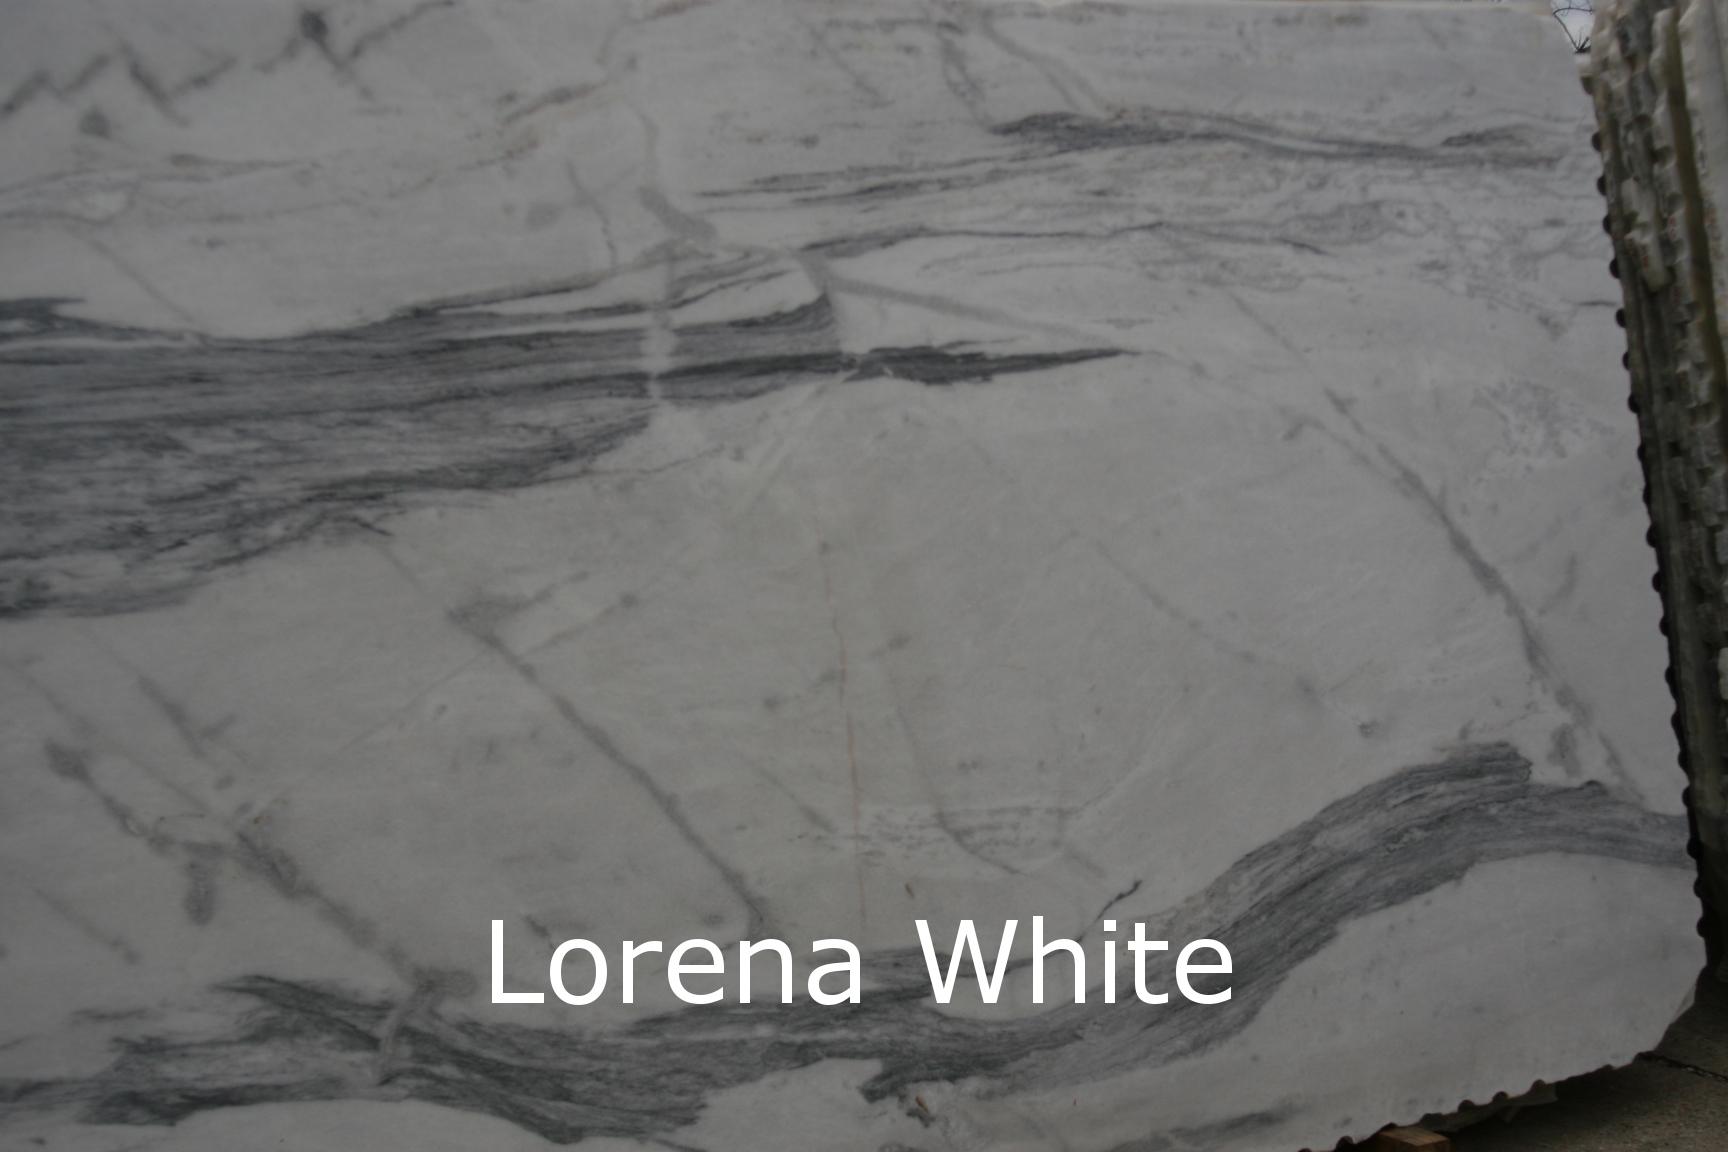 Lorena White